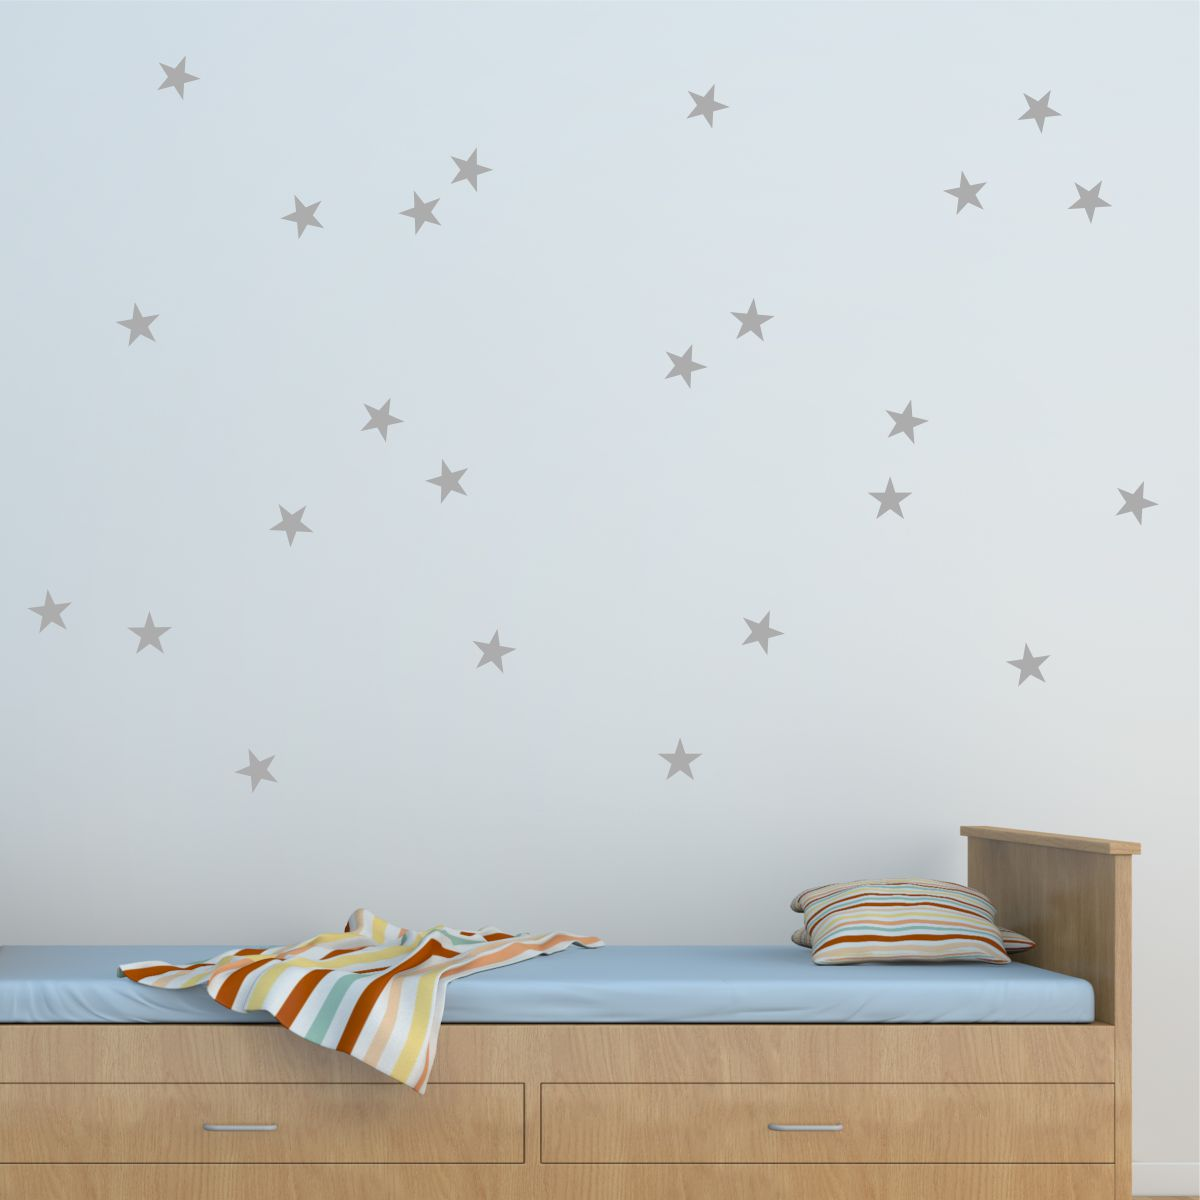 stars silver nursery bedroom wall art decal & Stars Wall Quotes™ Wall Art Decal | WallQuotes.com